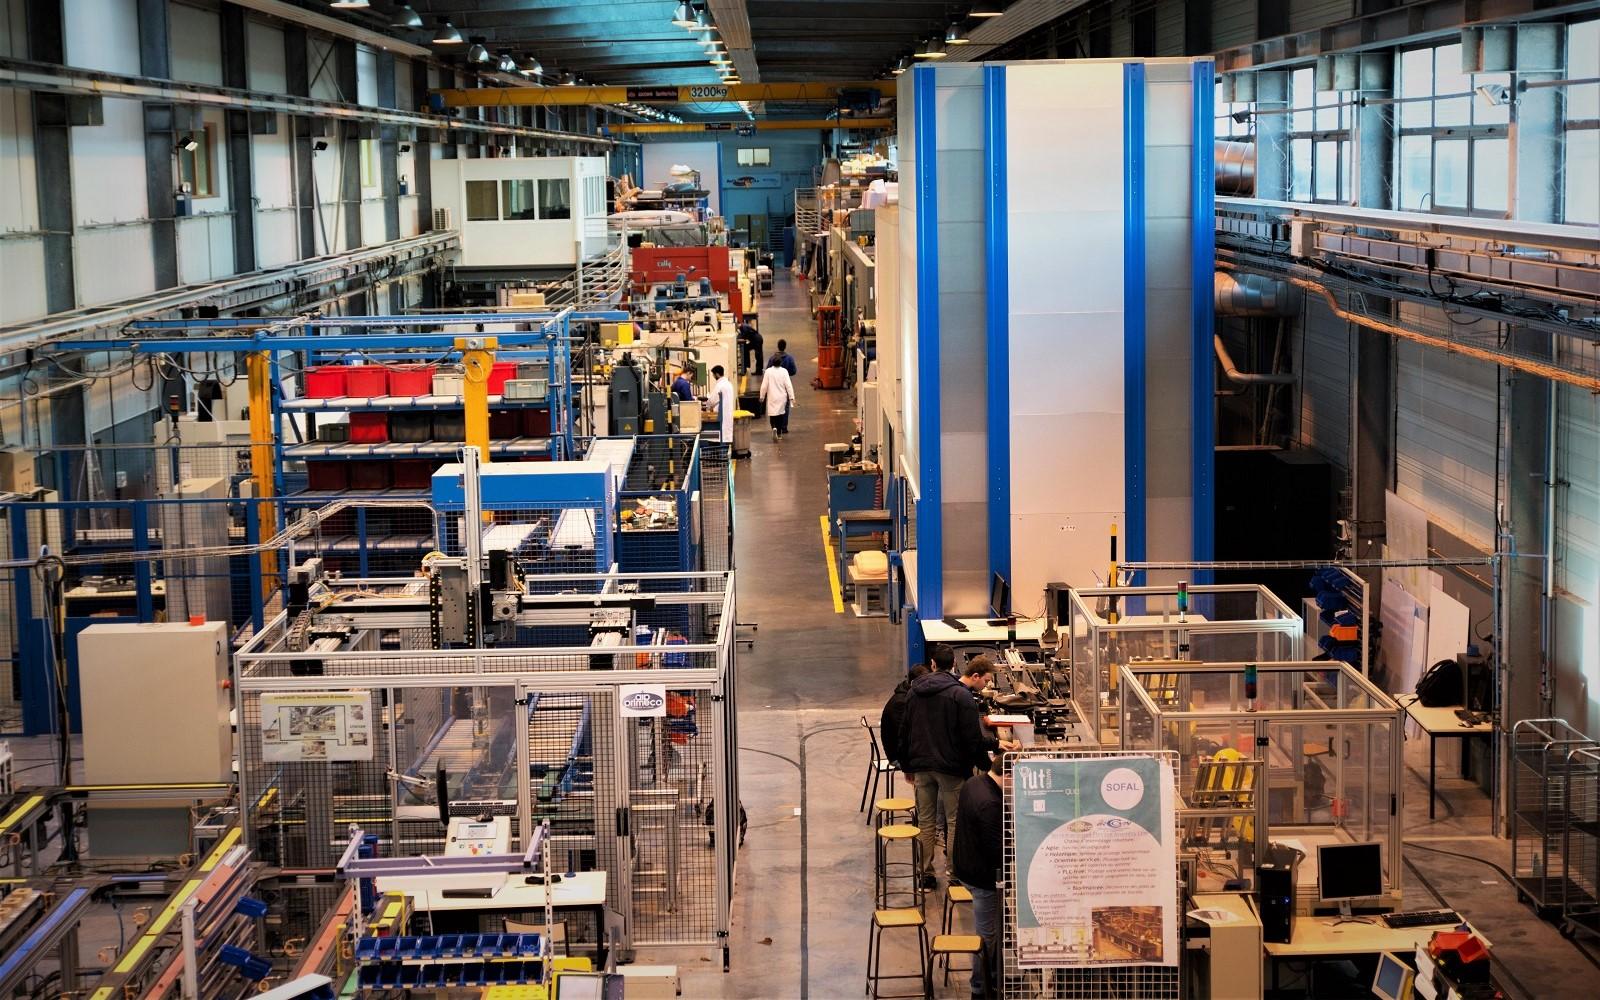 Halle-essai-IUT-robotique-industrielle